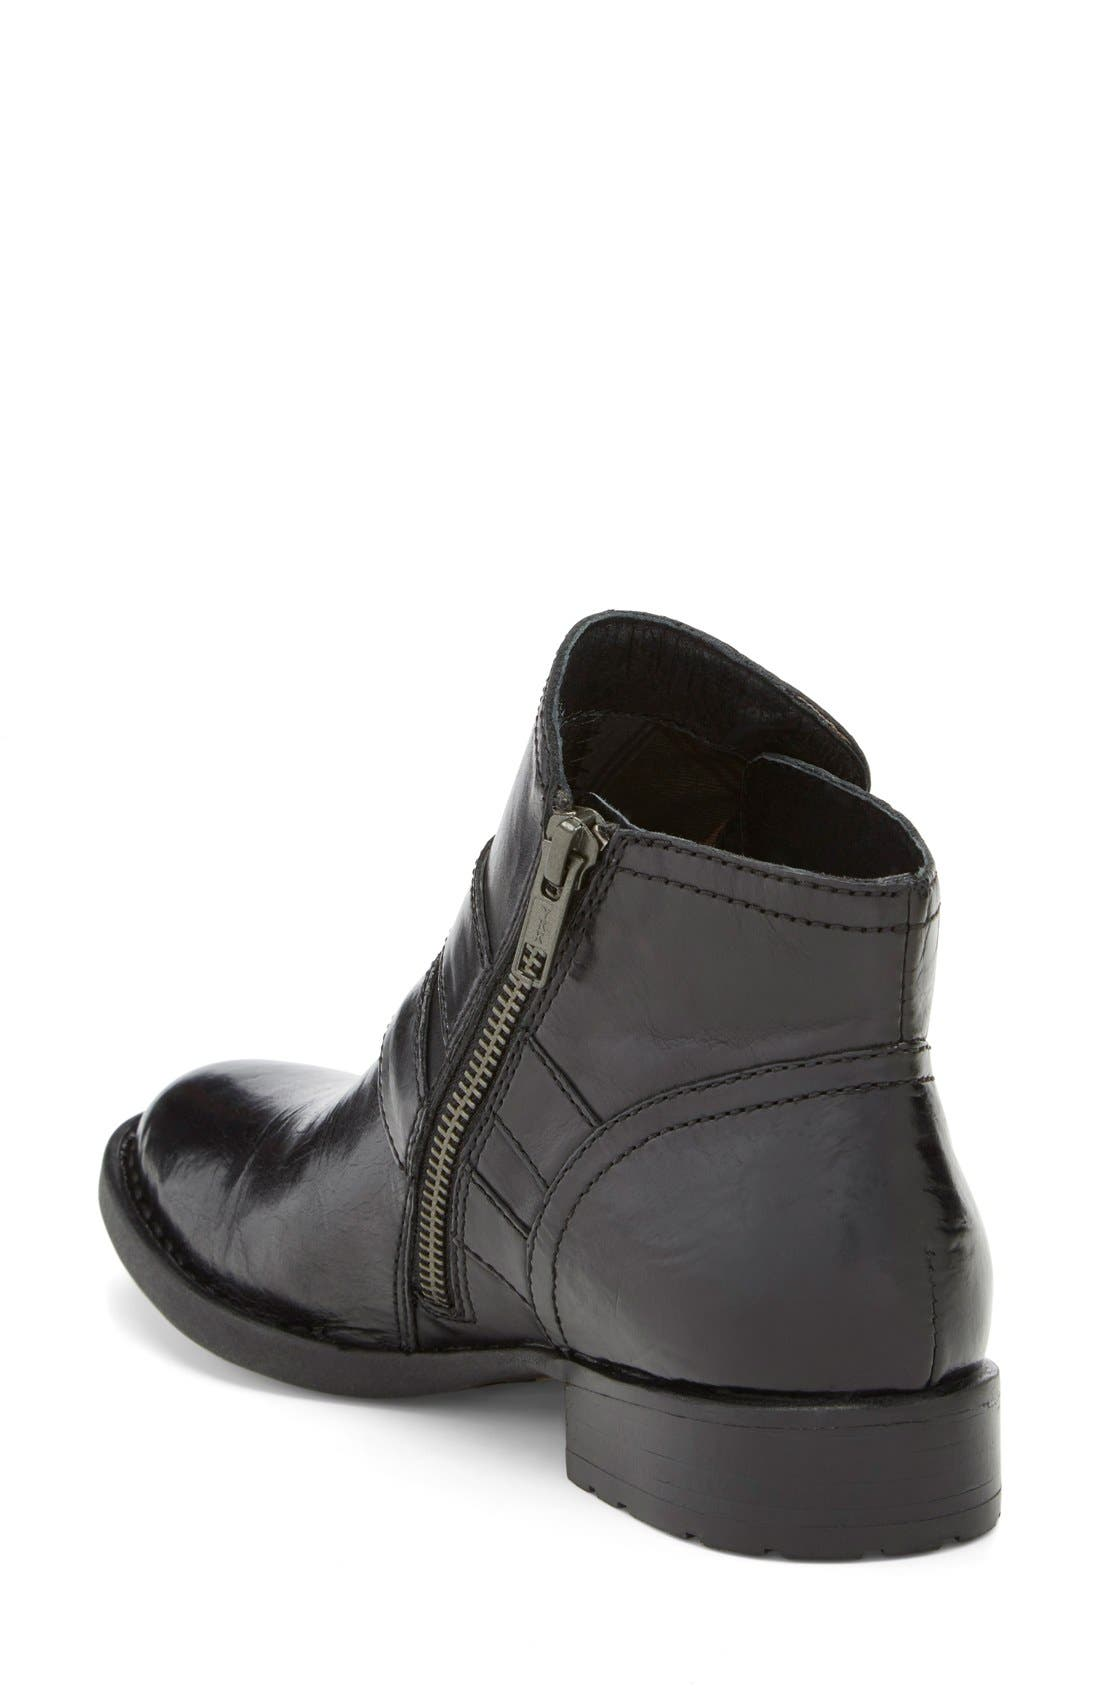 'Pirlo' Boot,                             Alternate thumbnail 2, color,                             001